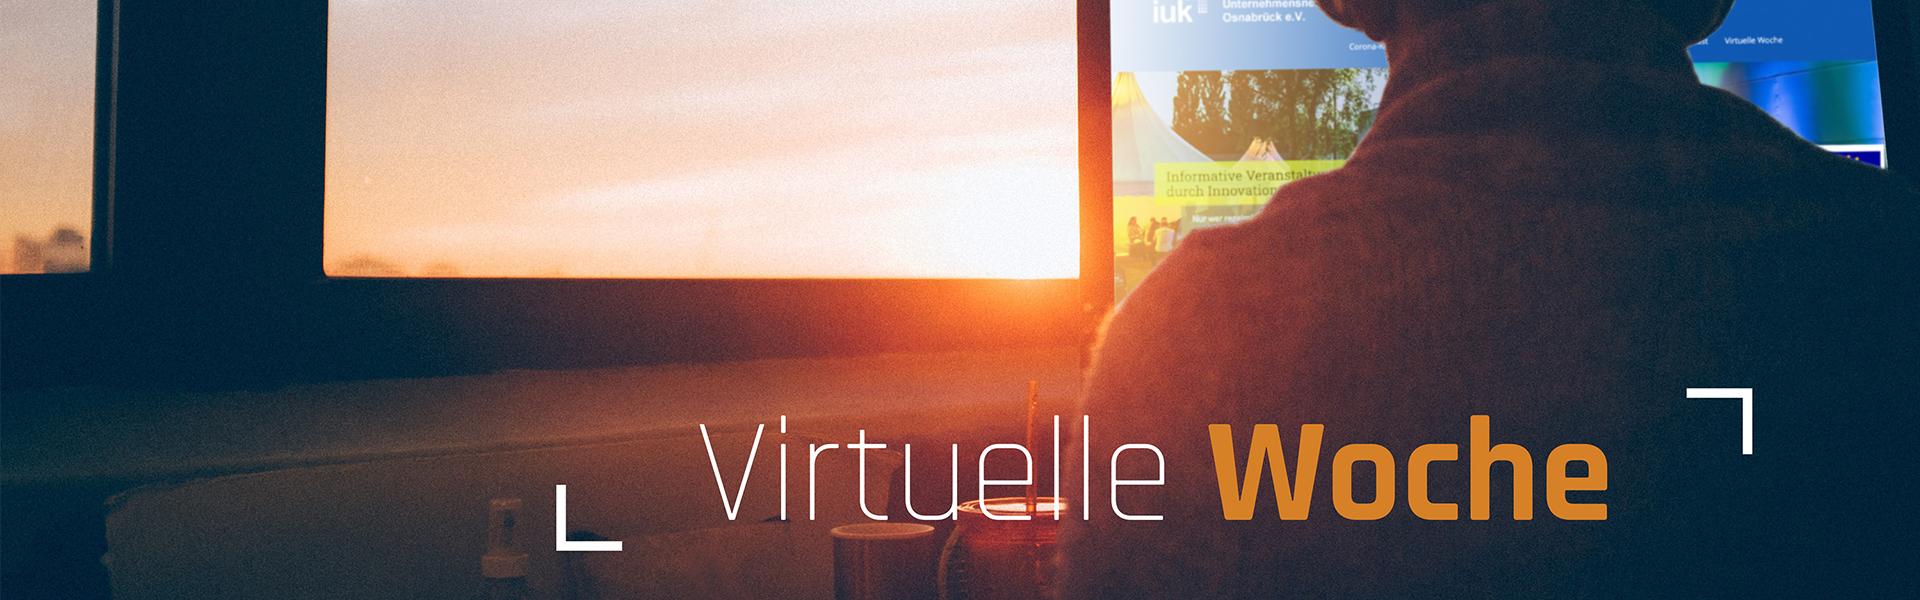 Virtuelle Woche